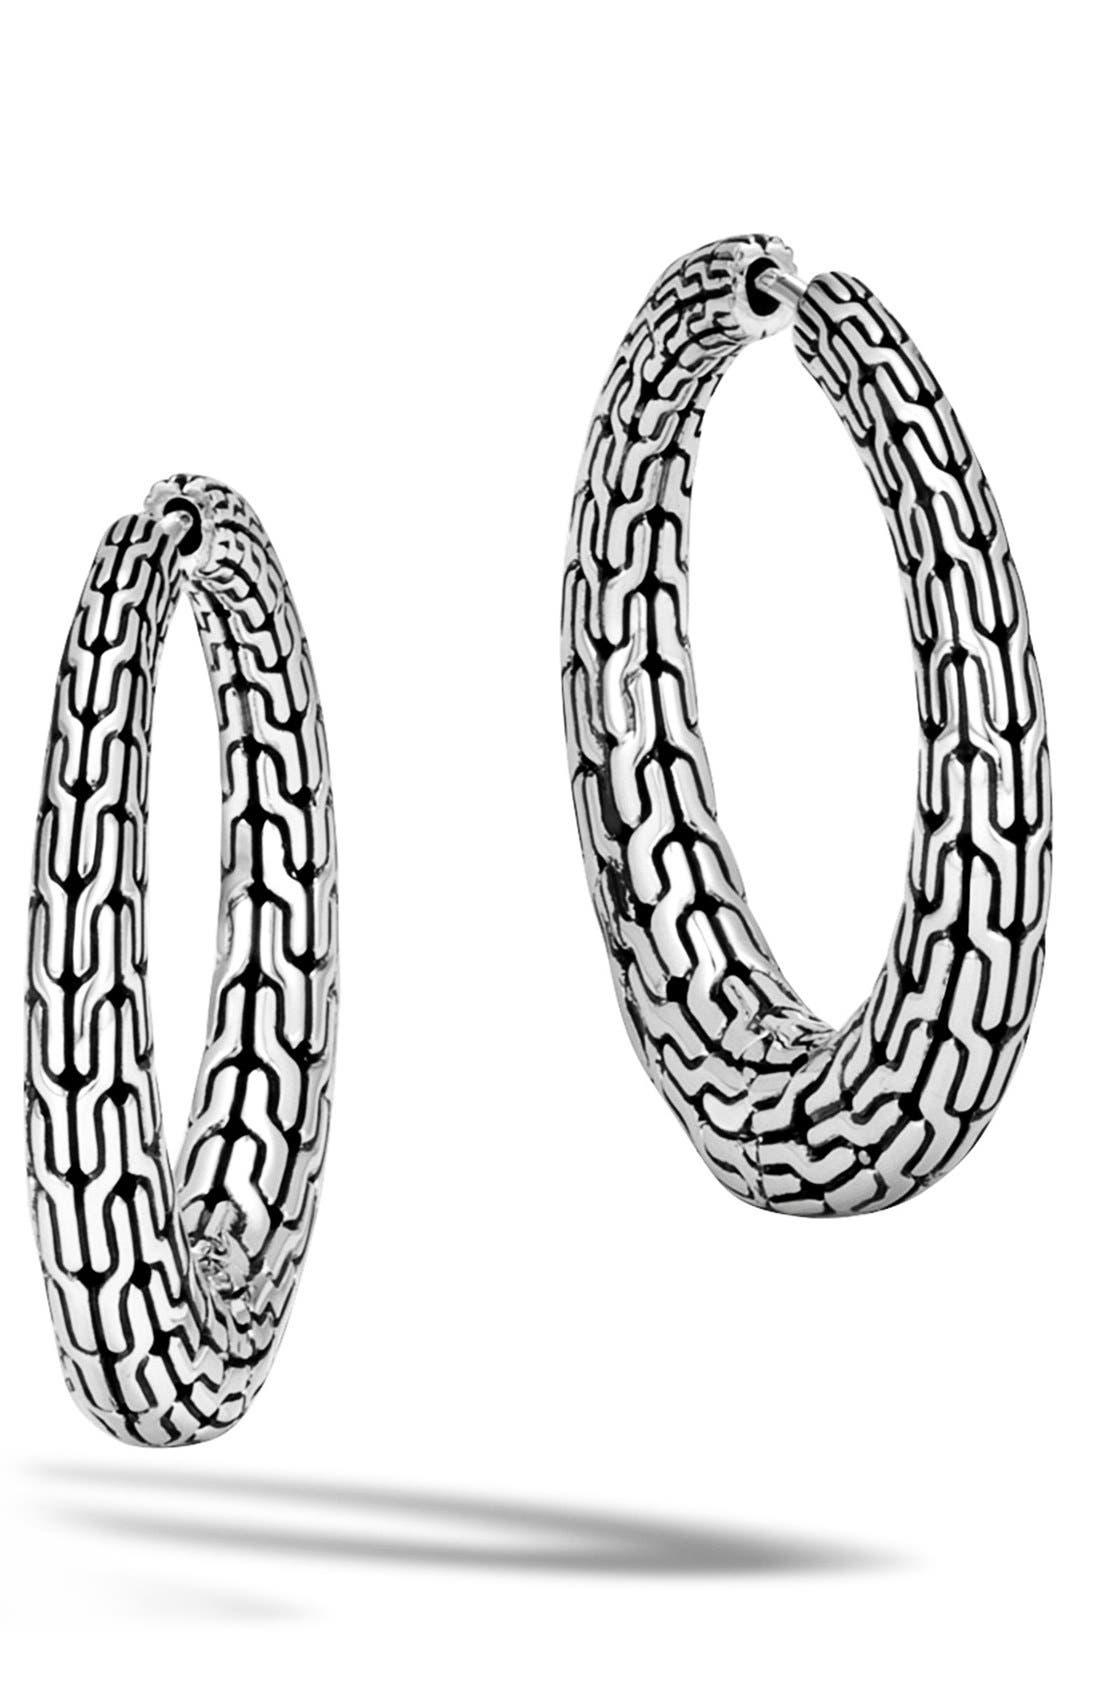 JOHN HARDY, Classic Chain Small Hinge Hoop Earrings, Main thumbnail 1, color, SILVER